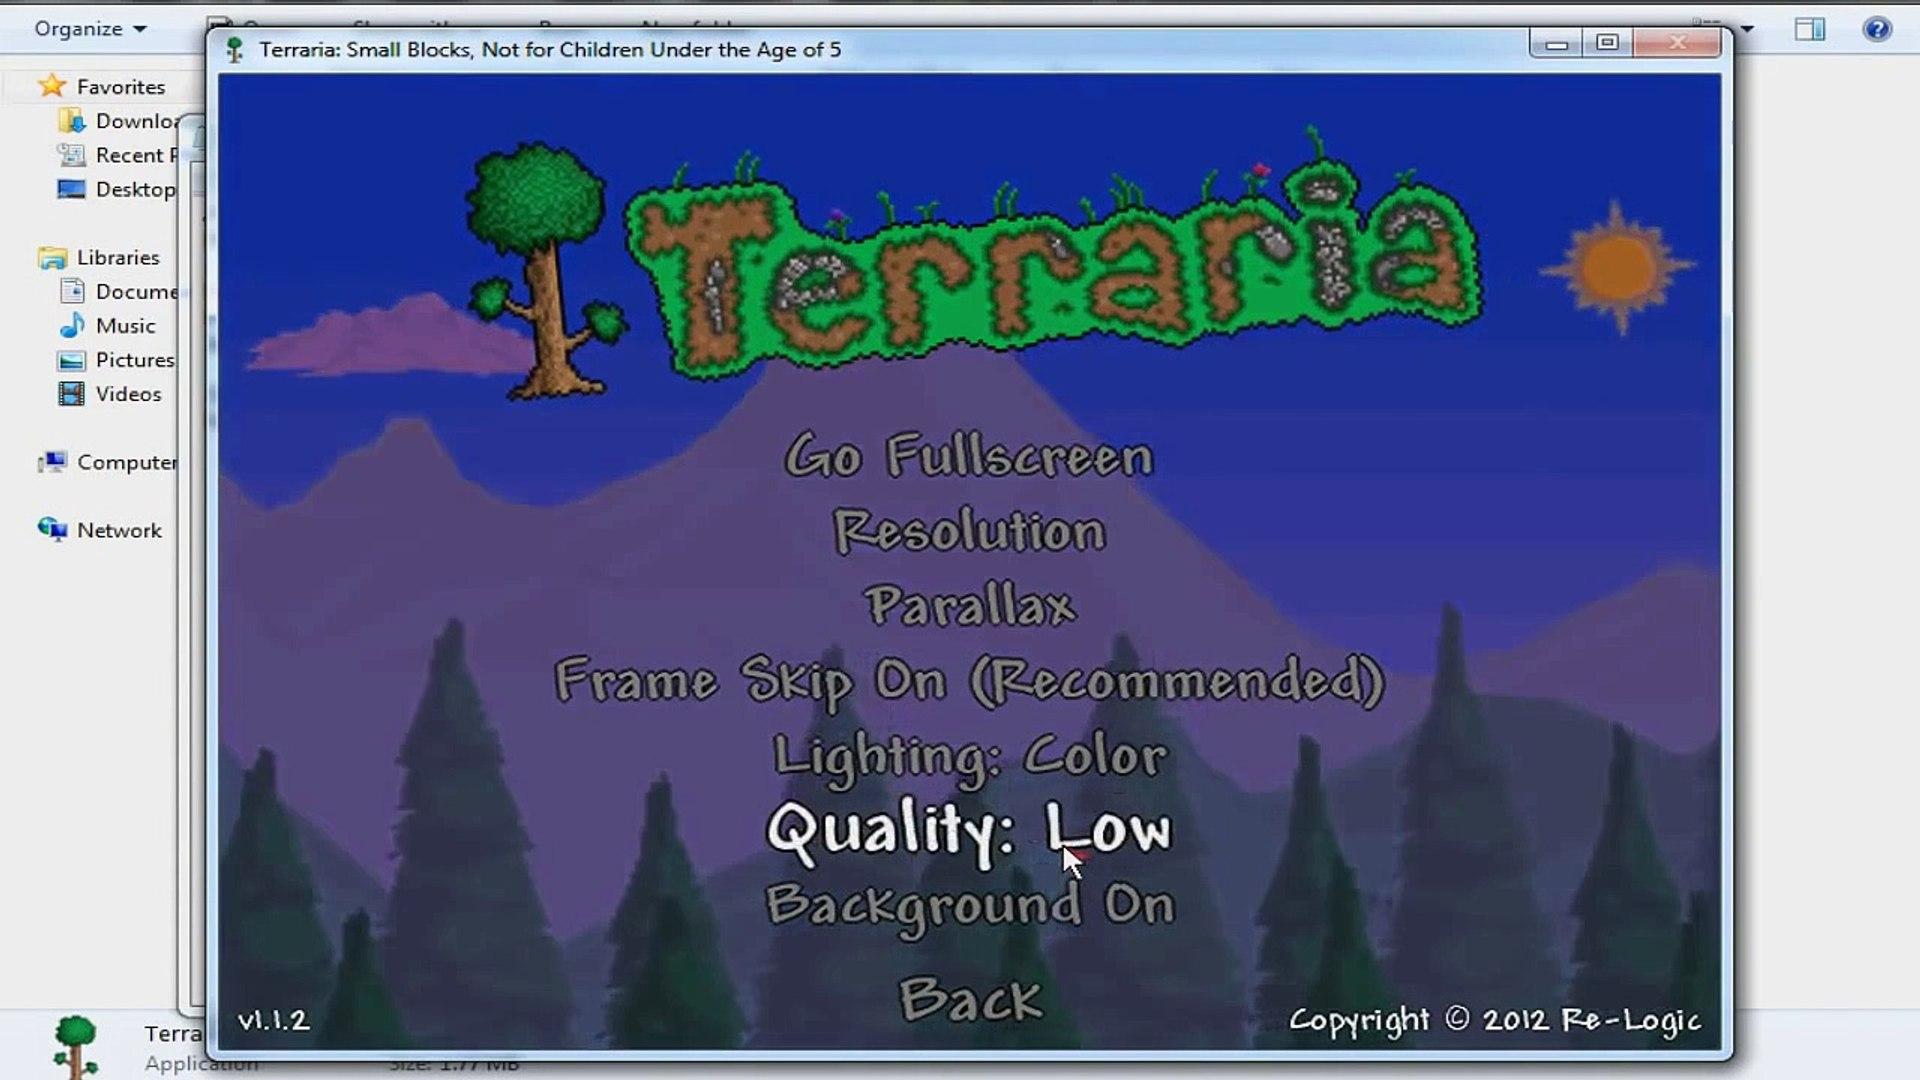 Terraria: How to get rid of Lag/Speed up (TechManiiac)